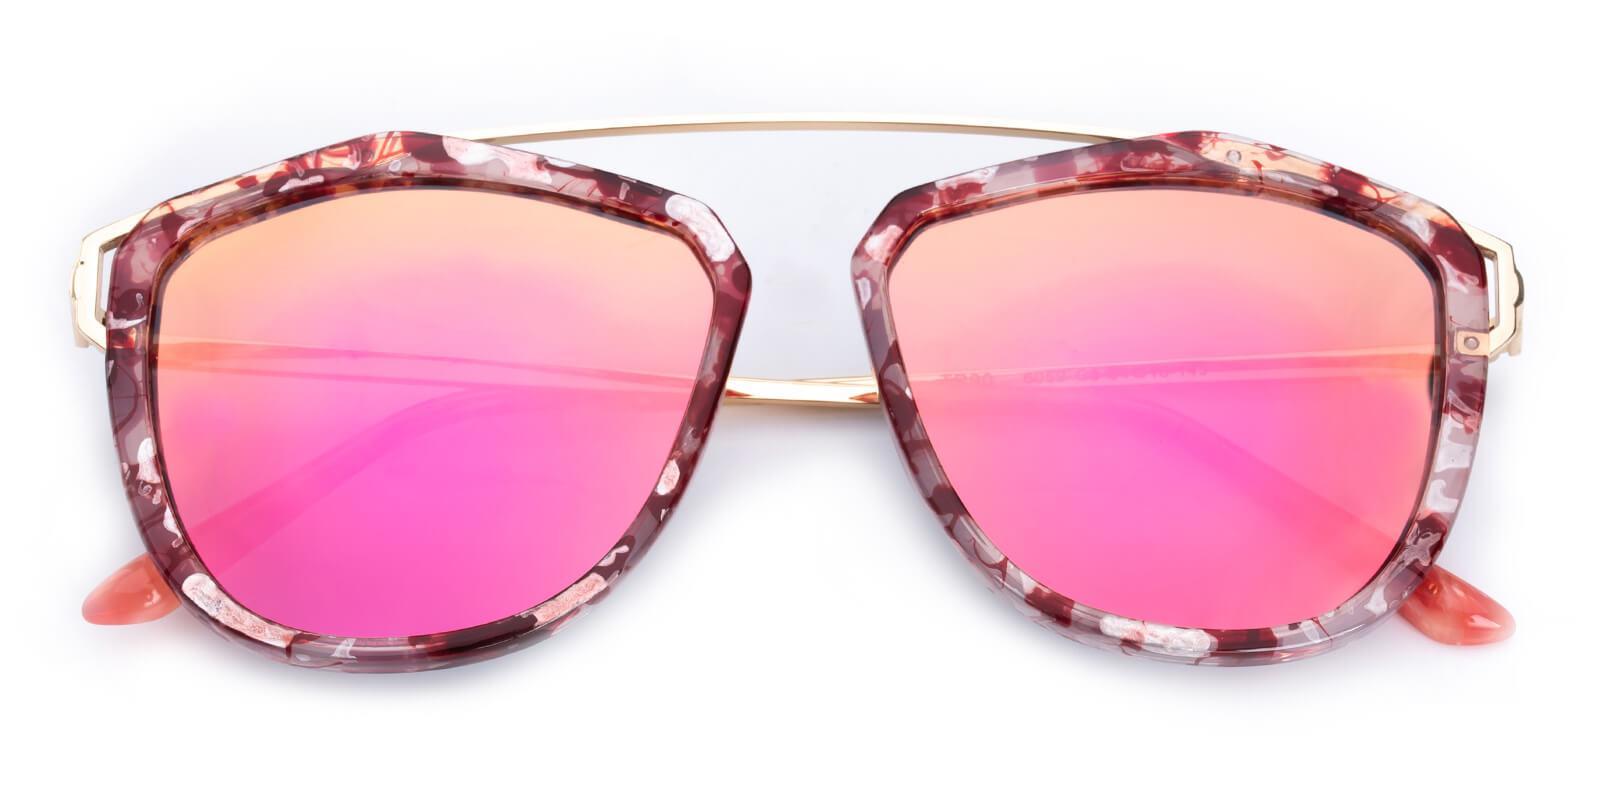 Phantom-Pink-Aviator-Metal / Combination / TR-Sunglasses-detail